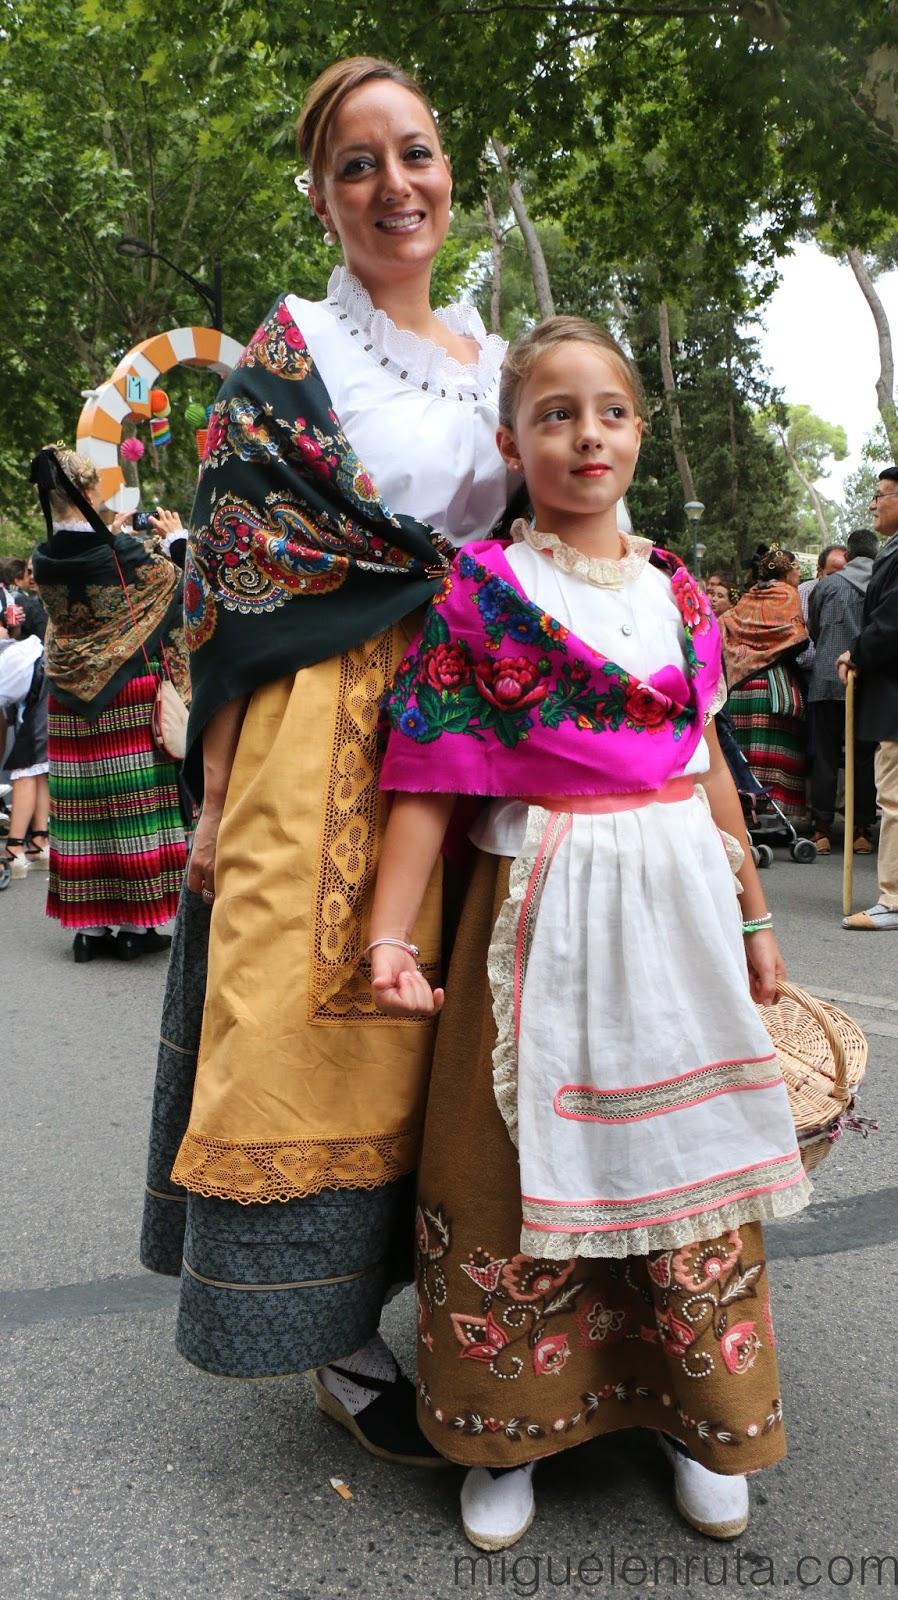 Fotos-retratos-Feria-de-Albacete_4